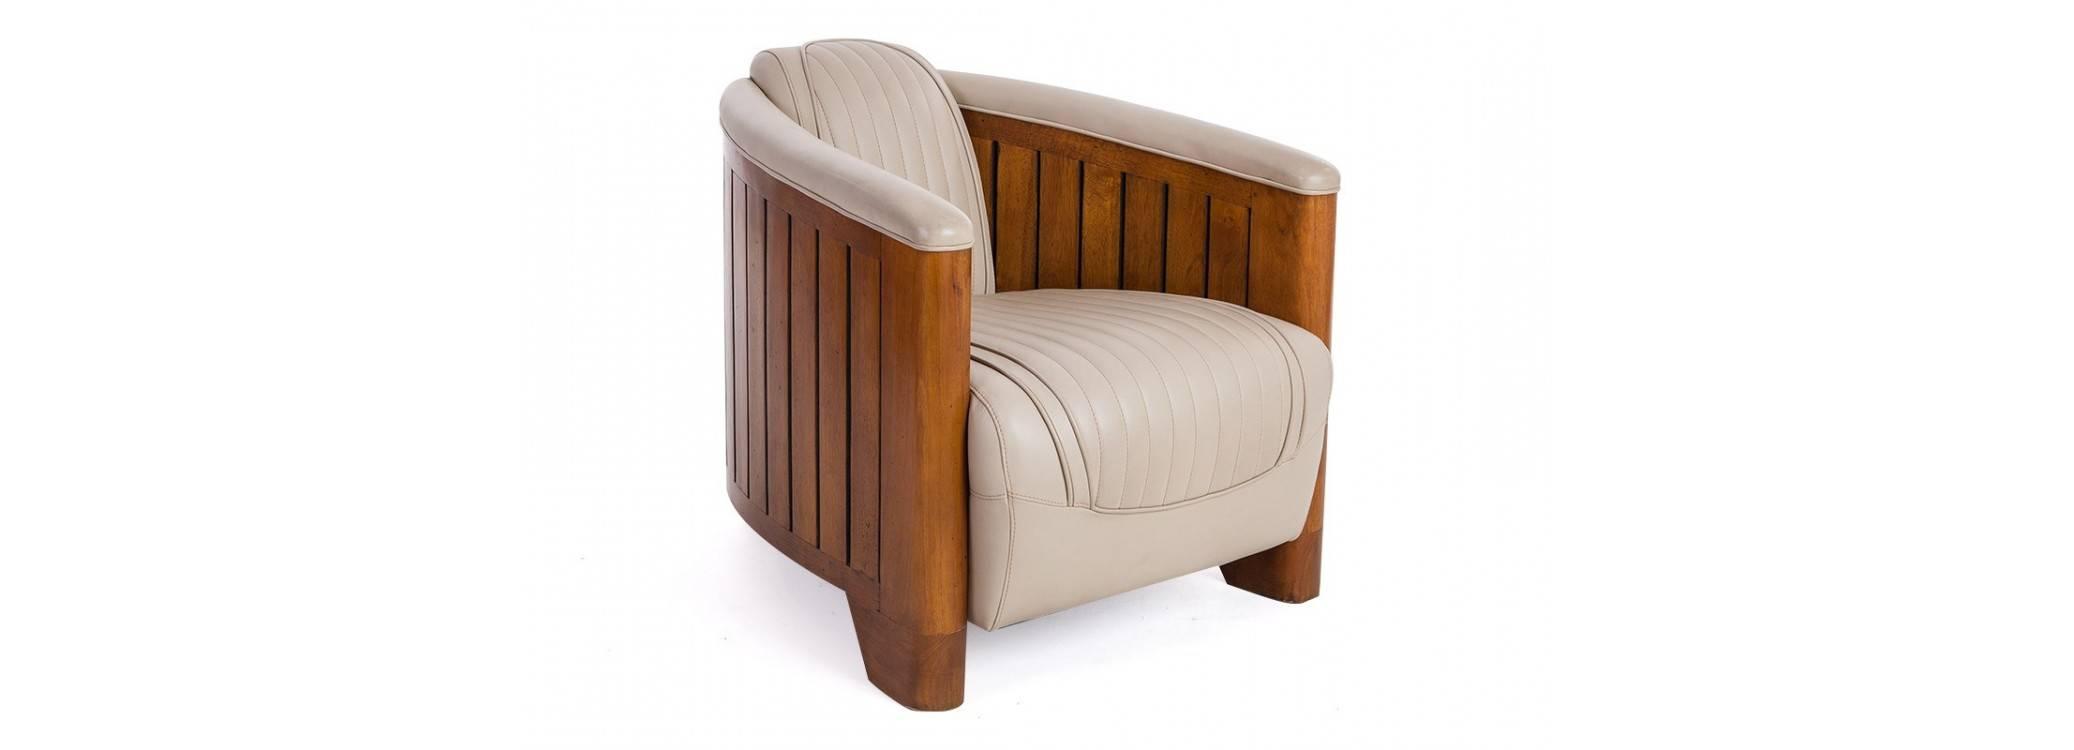 Canoë armchair - Beige leather